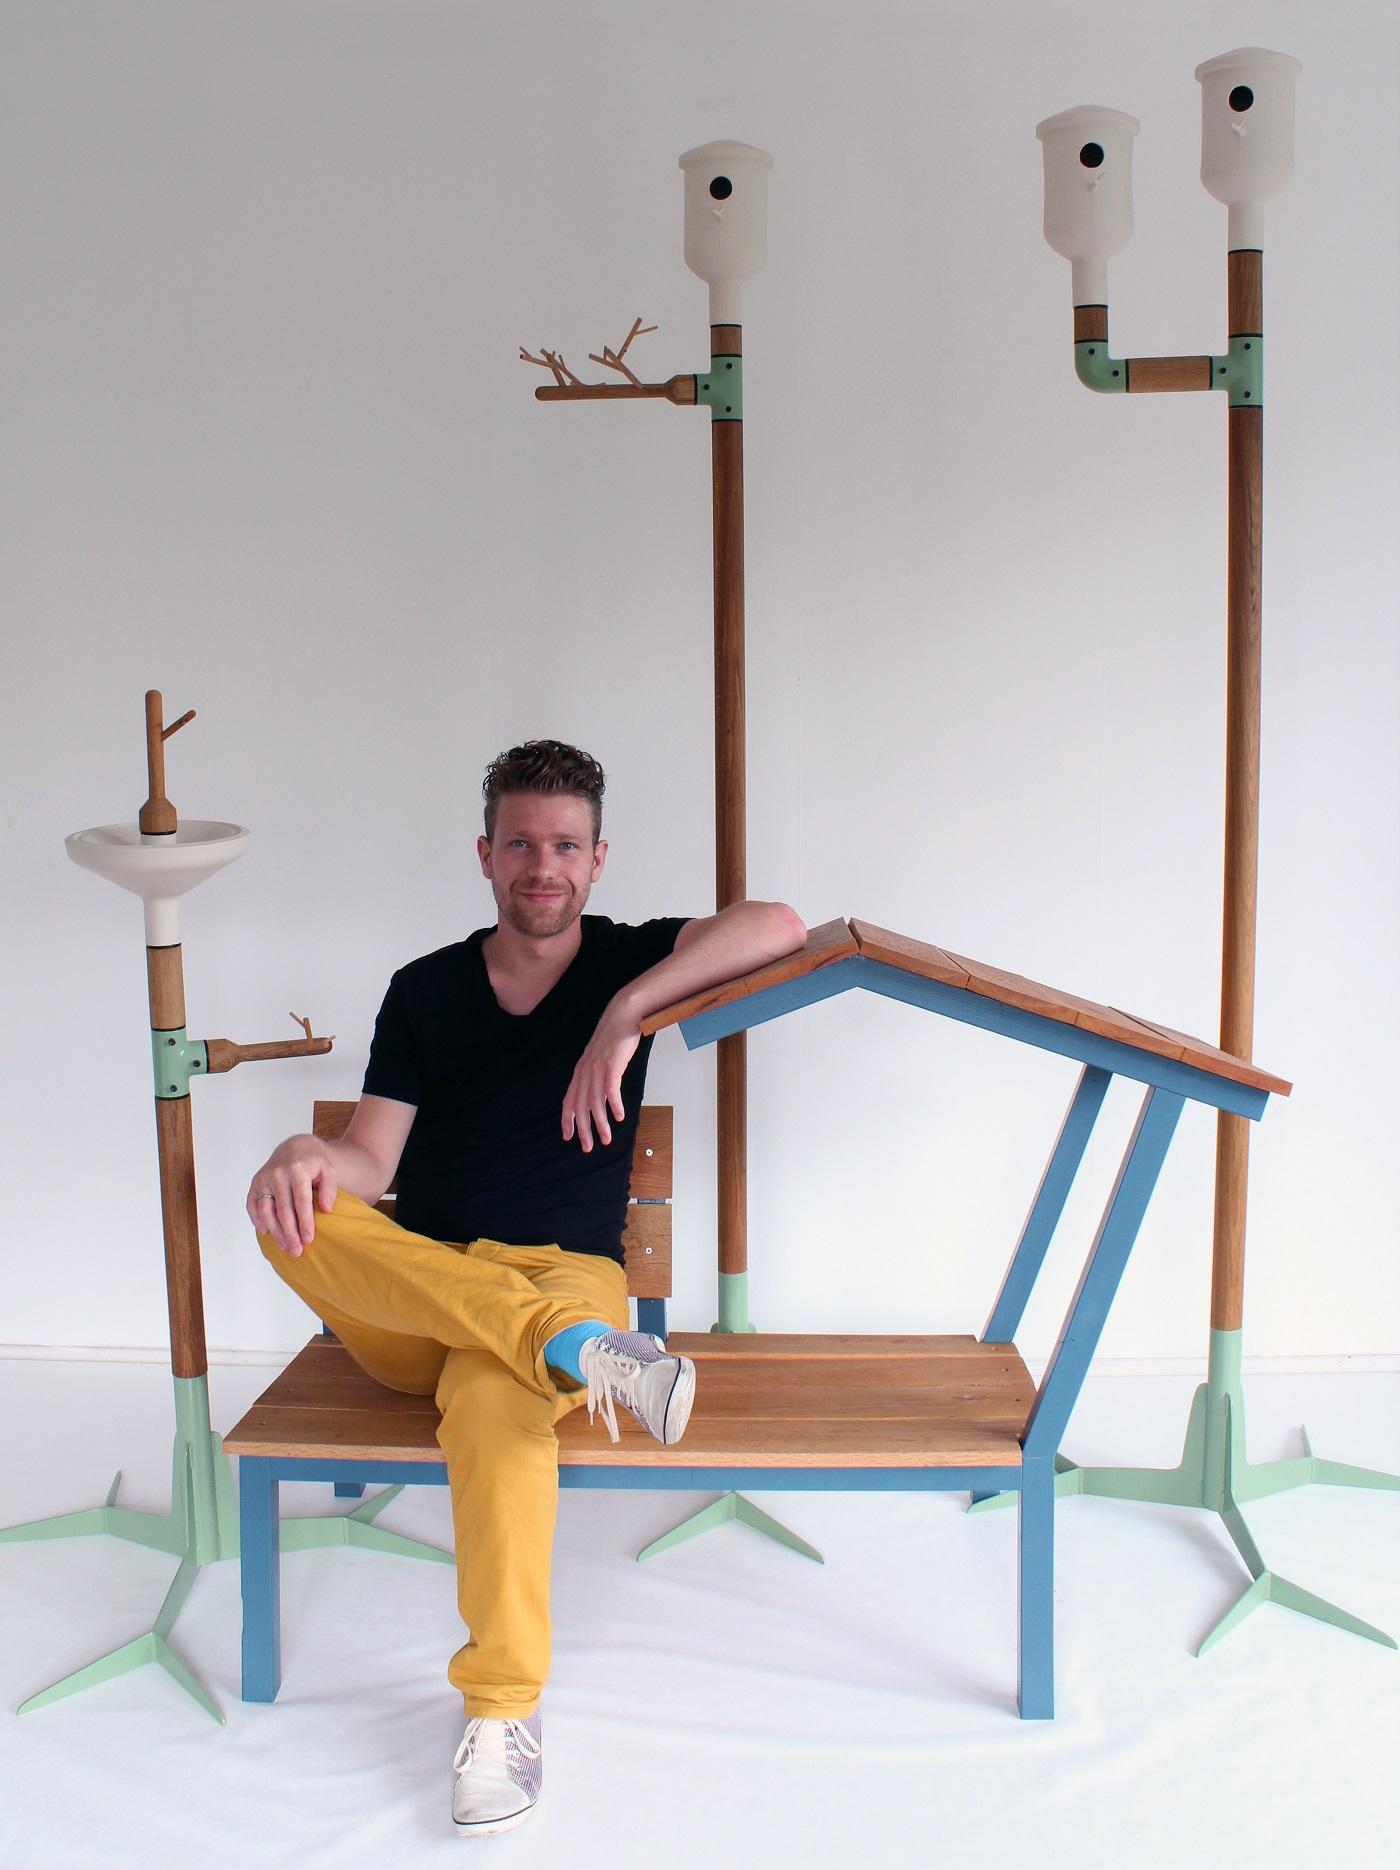 Vincent Bos en zijn Garden Elements o.a. vogelhuisje en drinkbakje in Gimmii Magazine